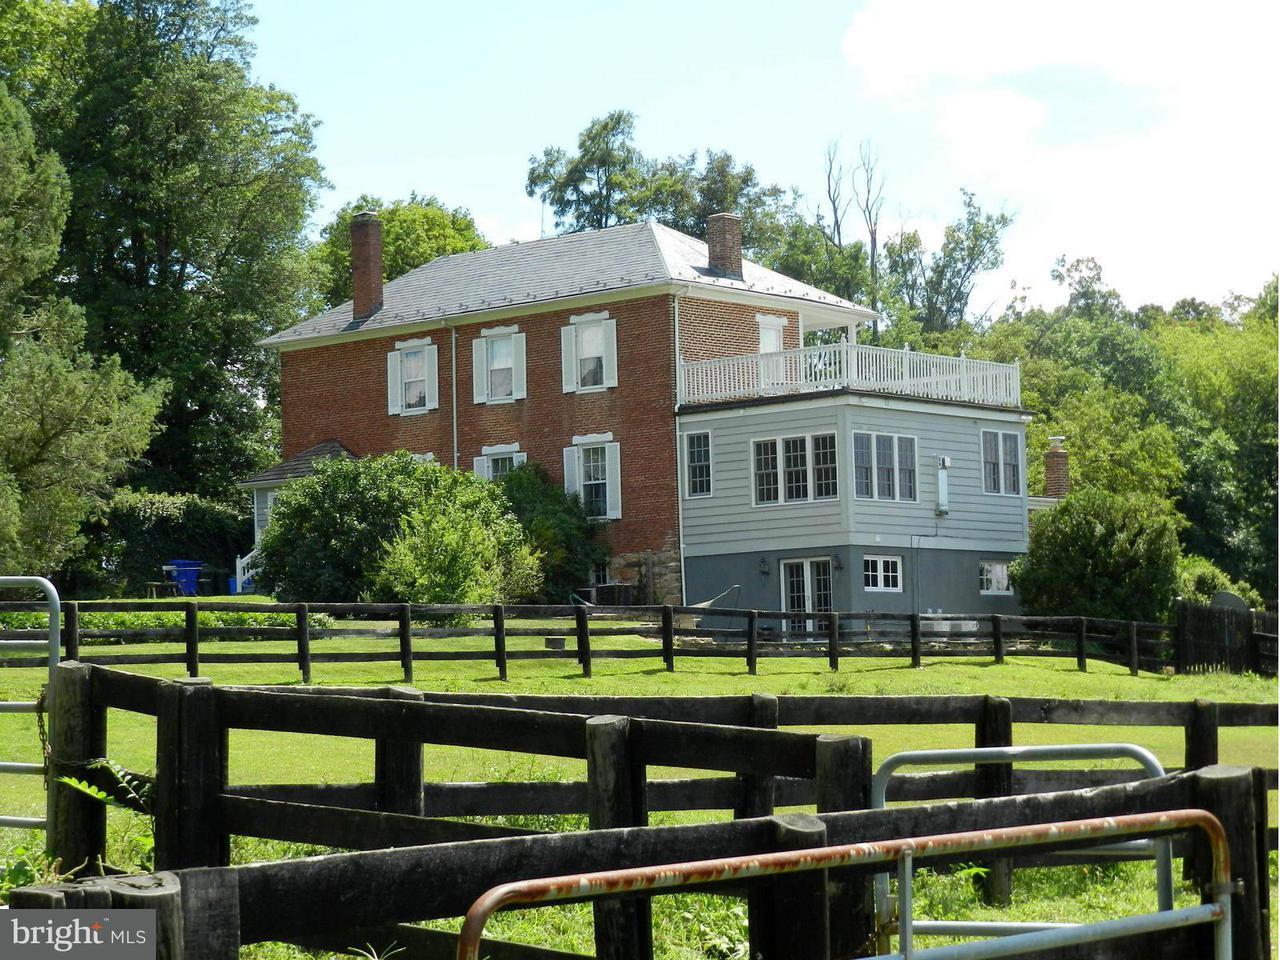 Fazenda / Quinta para Venda às 23720 MOUNT EPHRAIM Road 23720 MOUNT EPHRAIM Road Dickerson, Maryland 20842 Estados Unidos